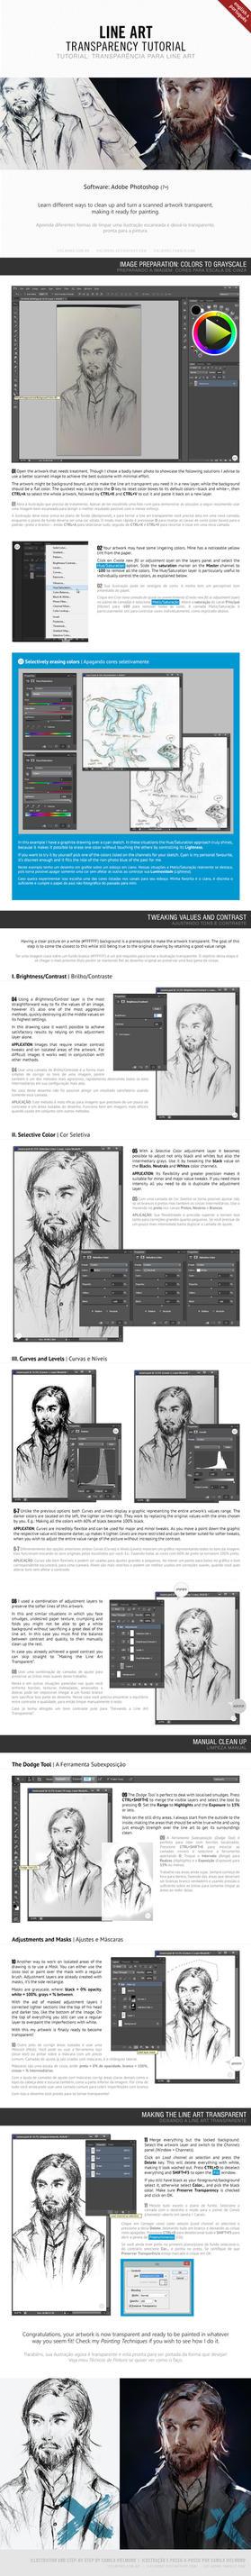 [PT and EN] Line Art Transparency Tutorial by vielmond